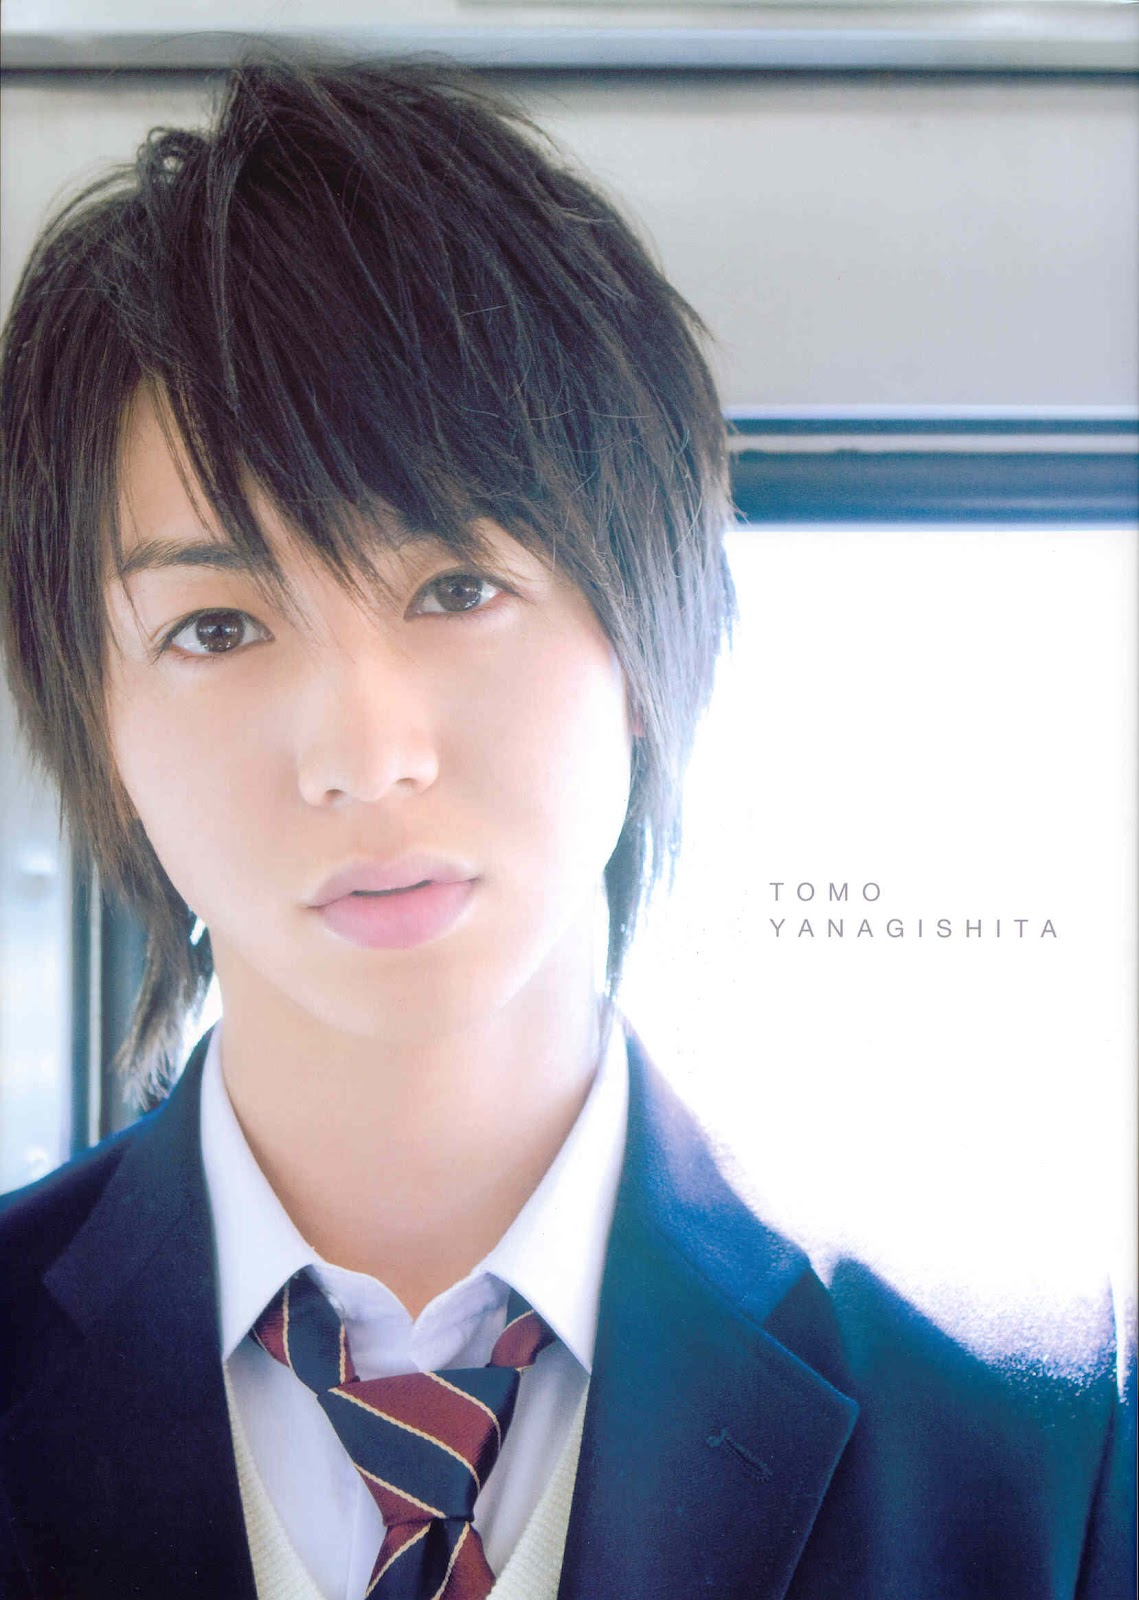 Toku Boys - Tomo Yanagishita | Mega Hero | Há um herói em ...